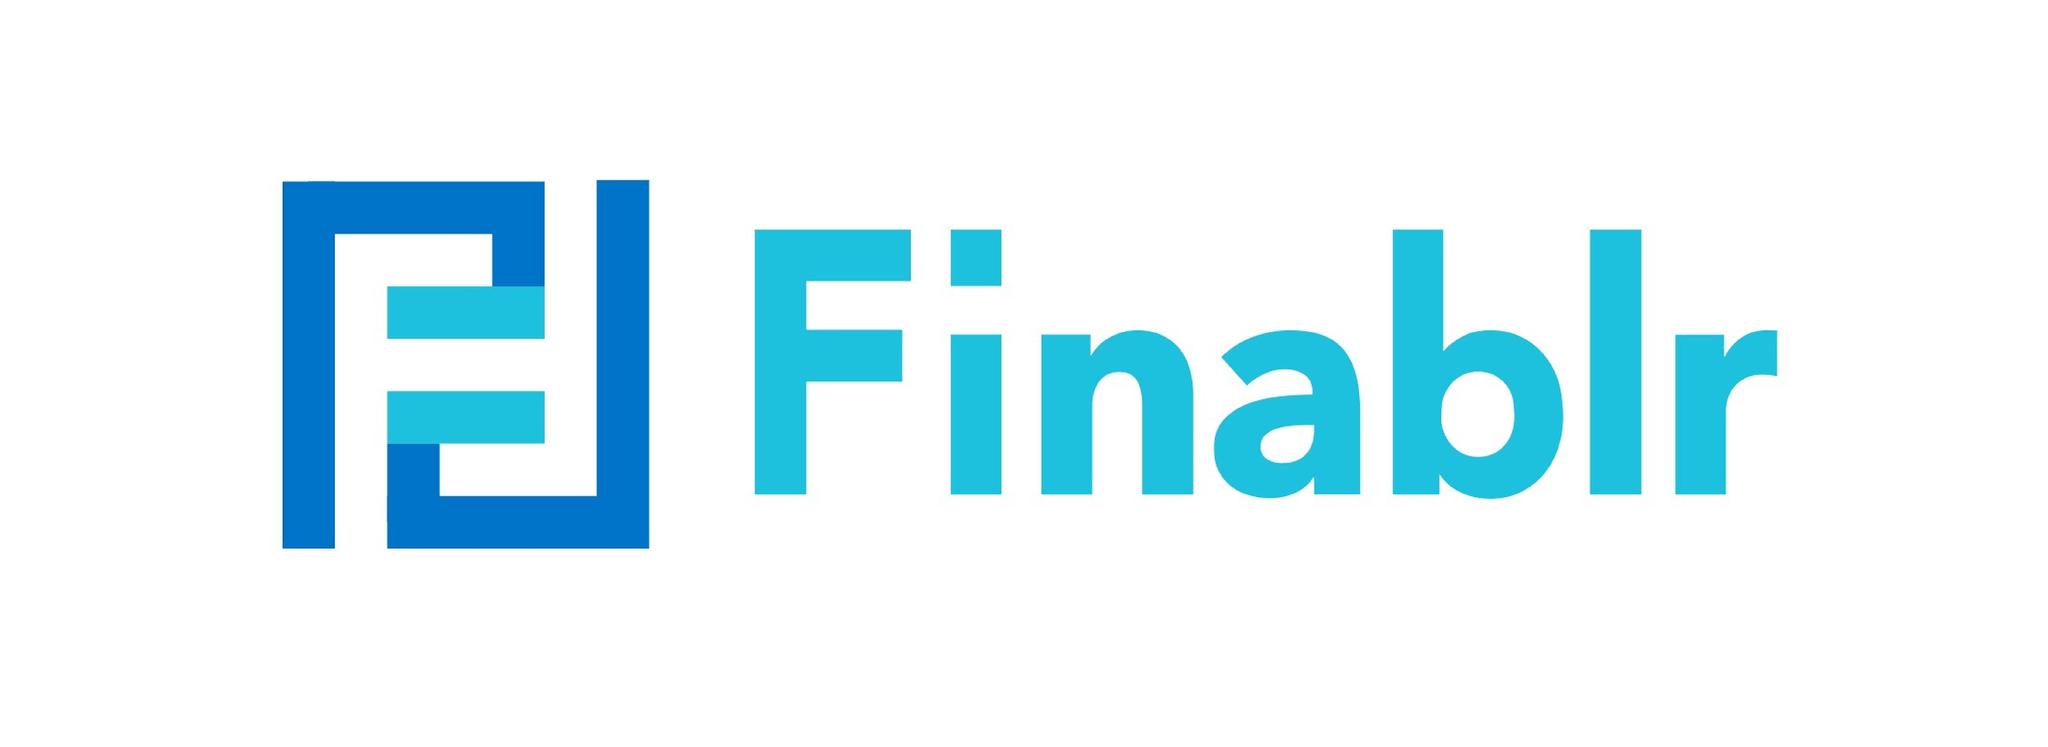 Finablr Sponsor logo